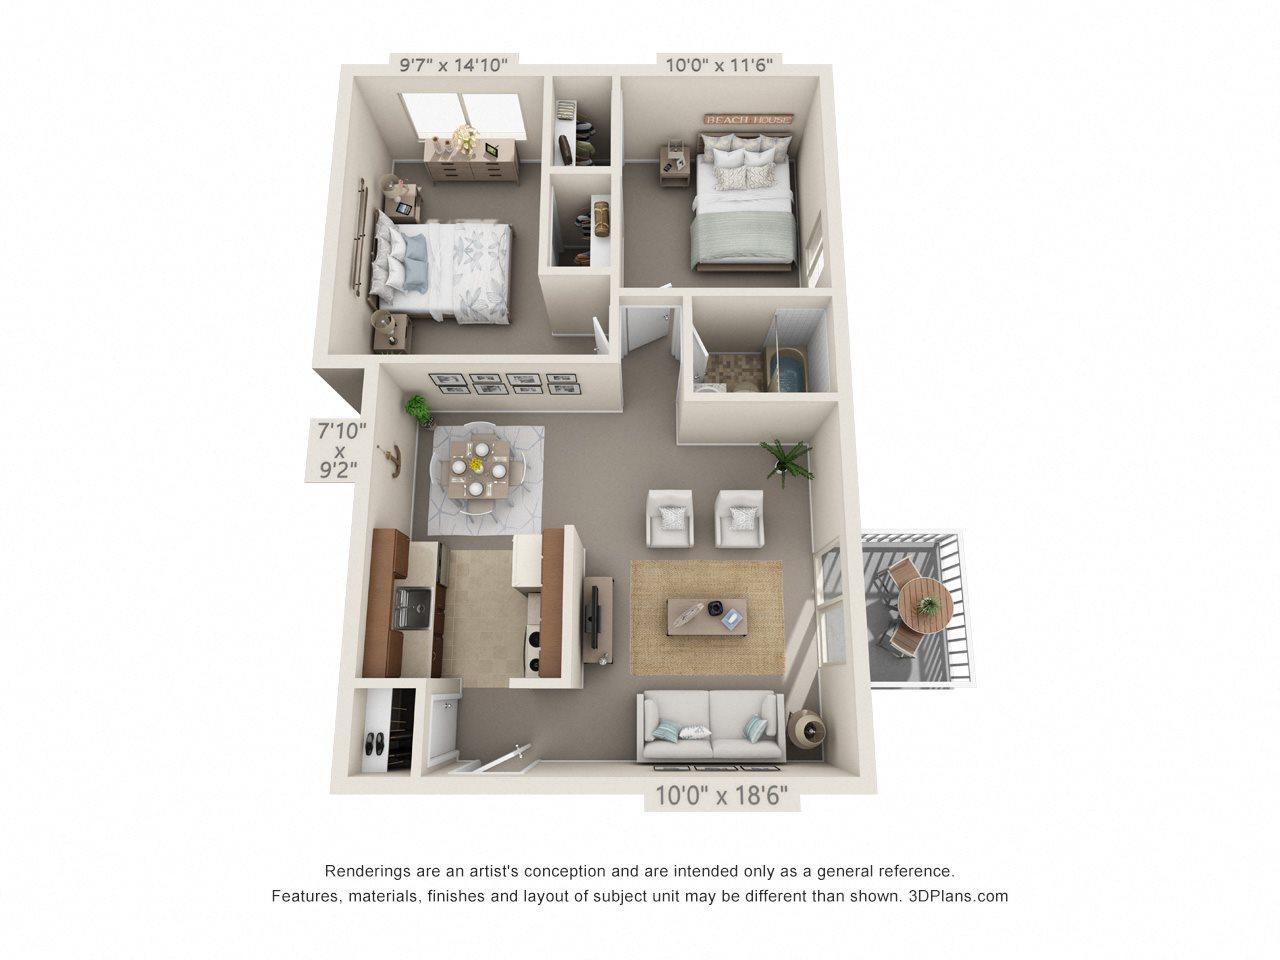 2 Bedroom, 1 Bath (Patio, Heat Paid) Floor Plan 11